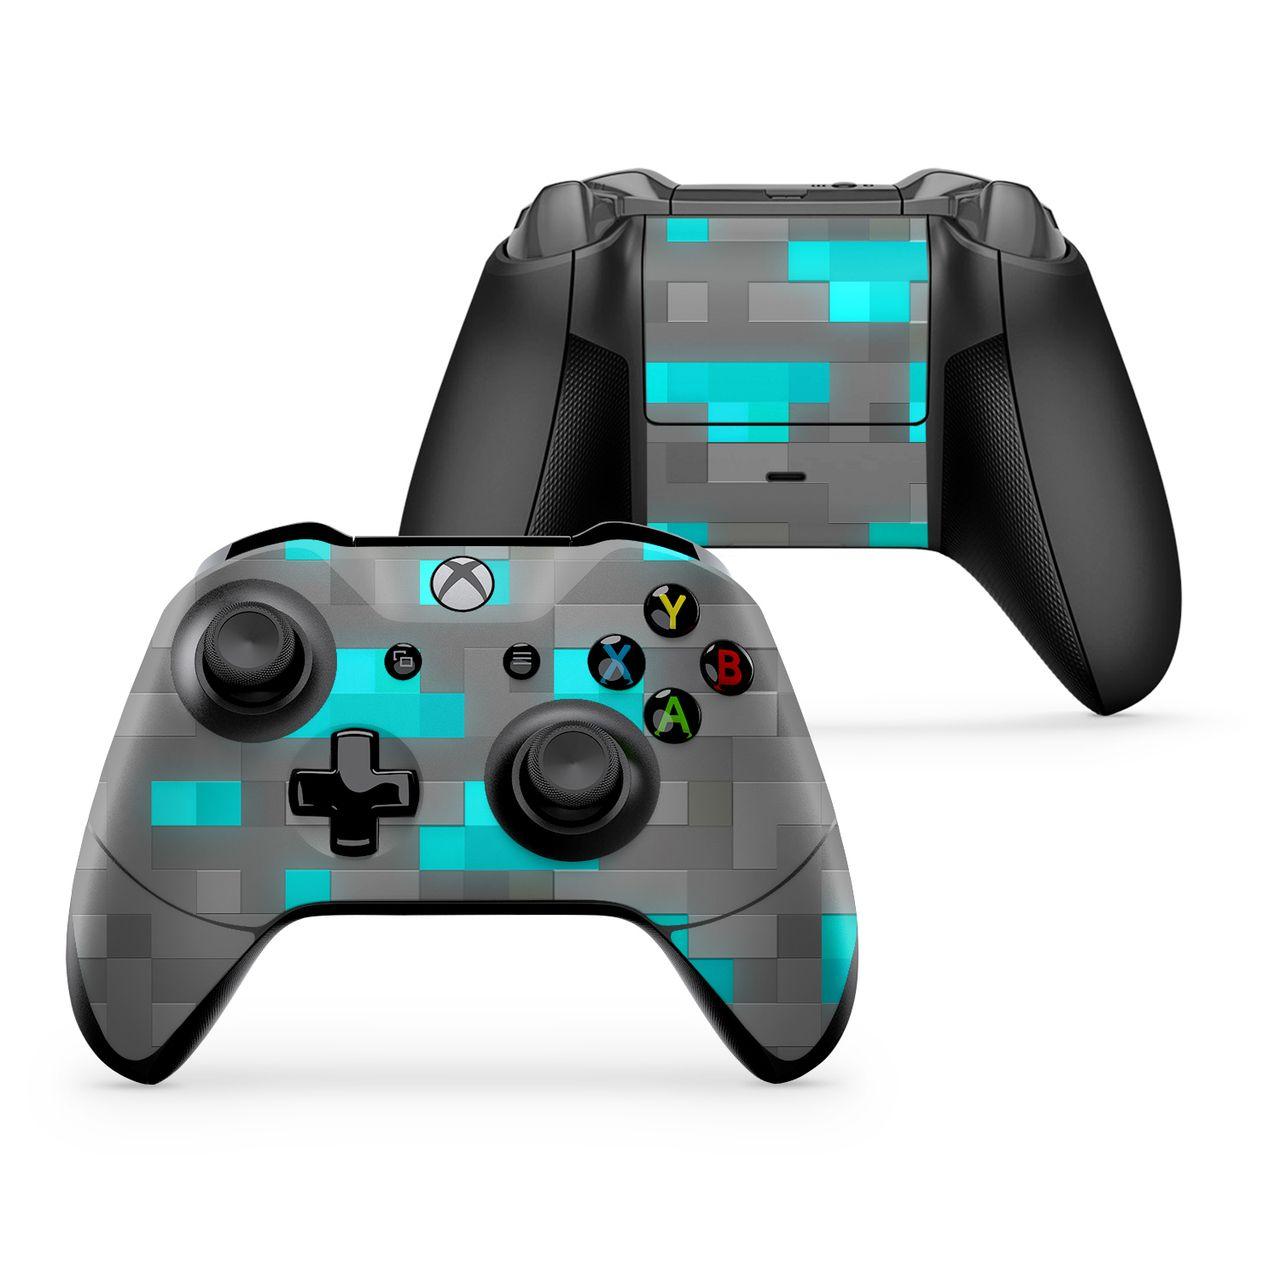 Pixel Diamond Block Xbox One X Controller Minecraft Pixel Art Xbox Controller Xbox One Controller Black Xbox